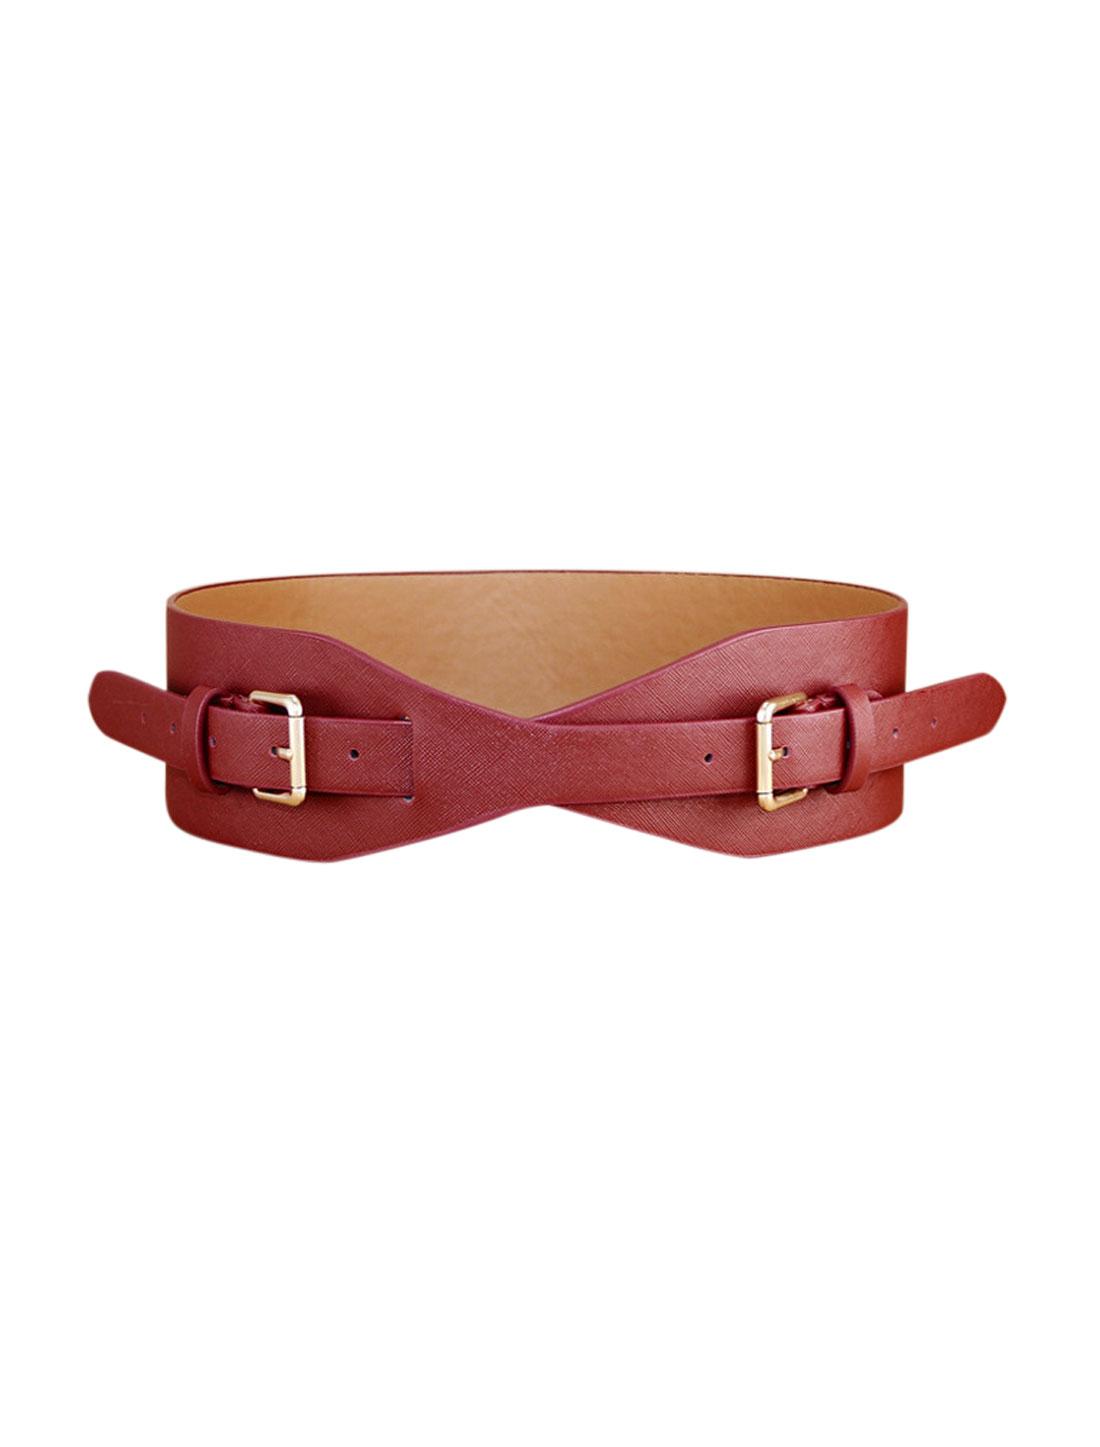 Women Adjustable Wide PU Double Buckle Retro Cinch Belt Red